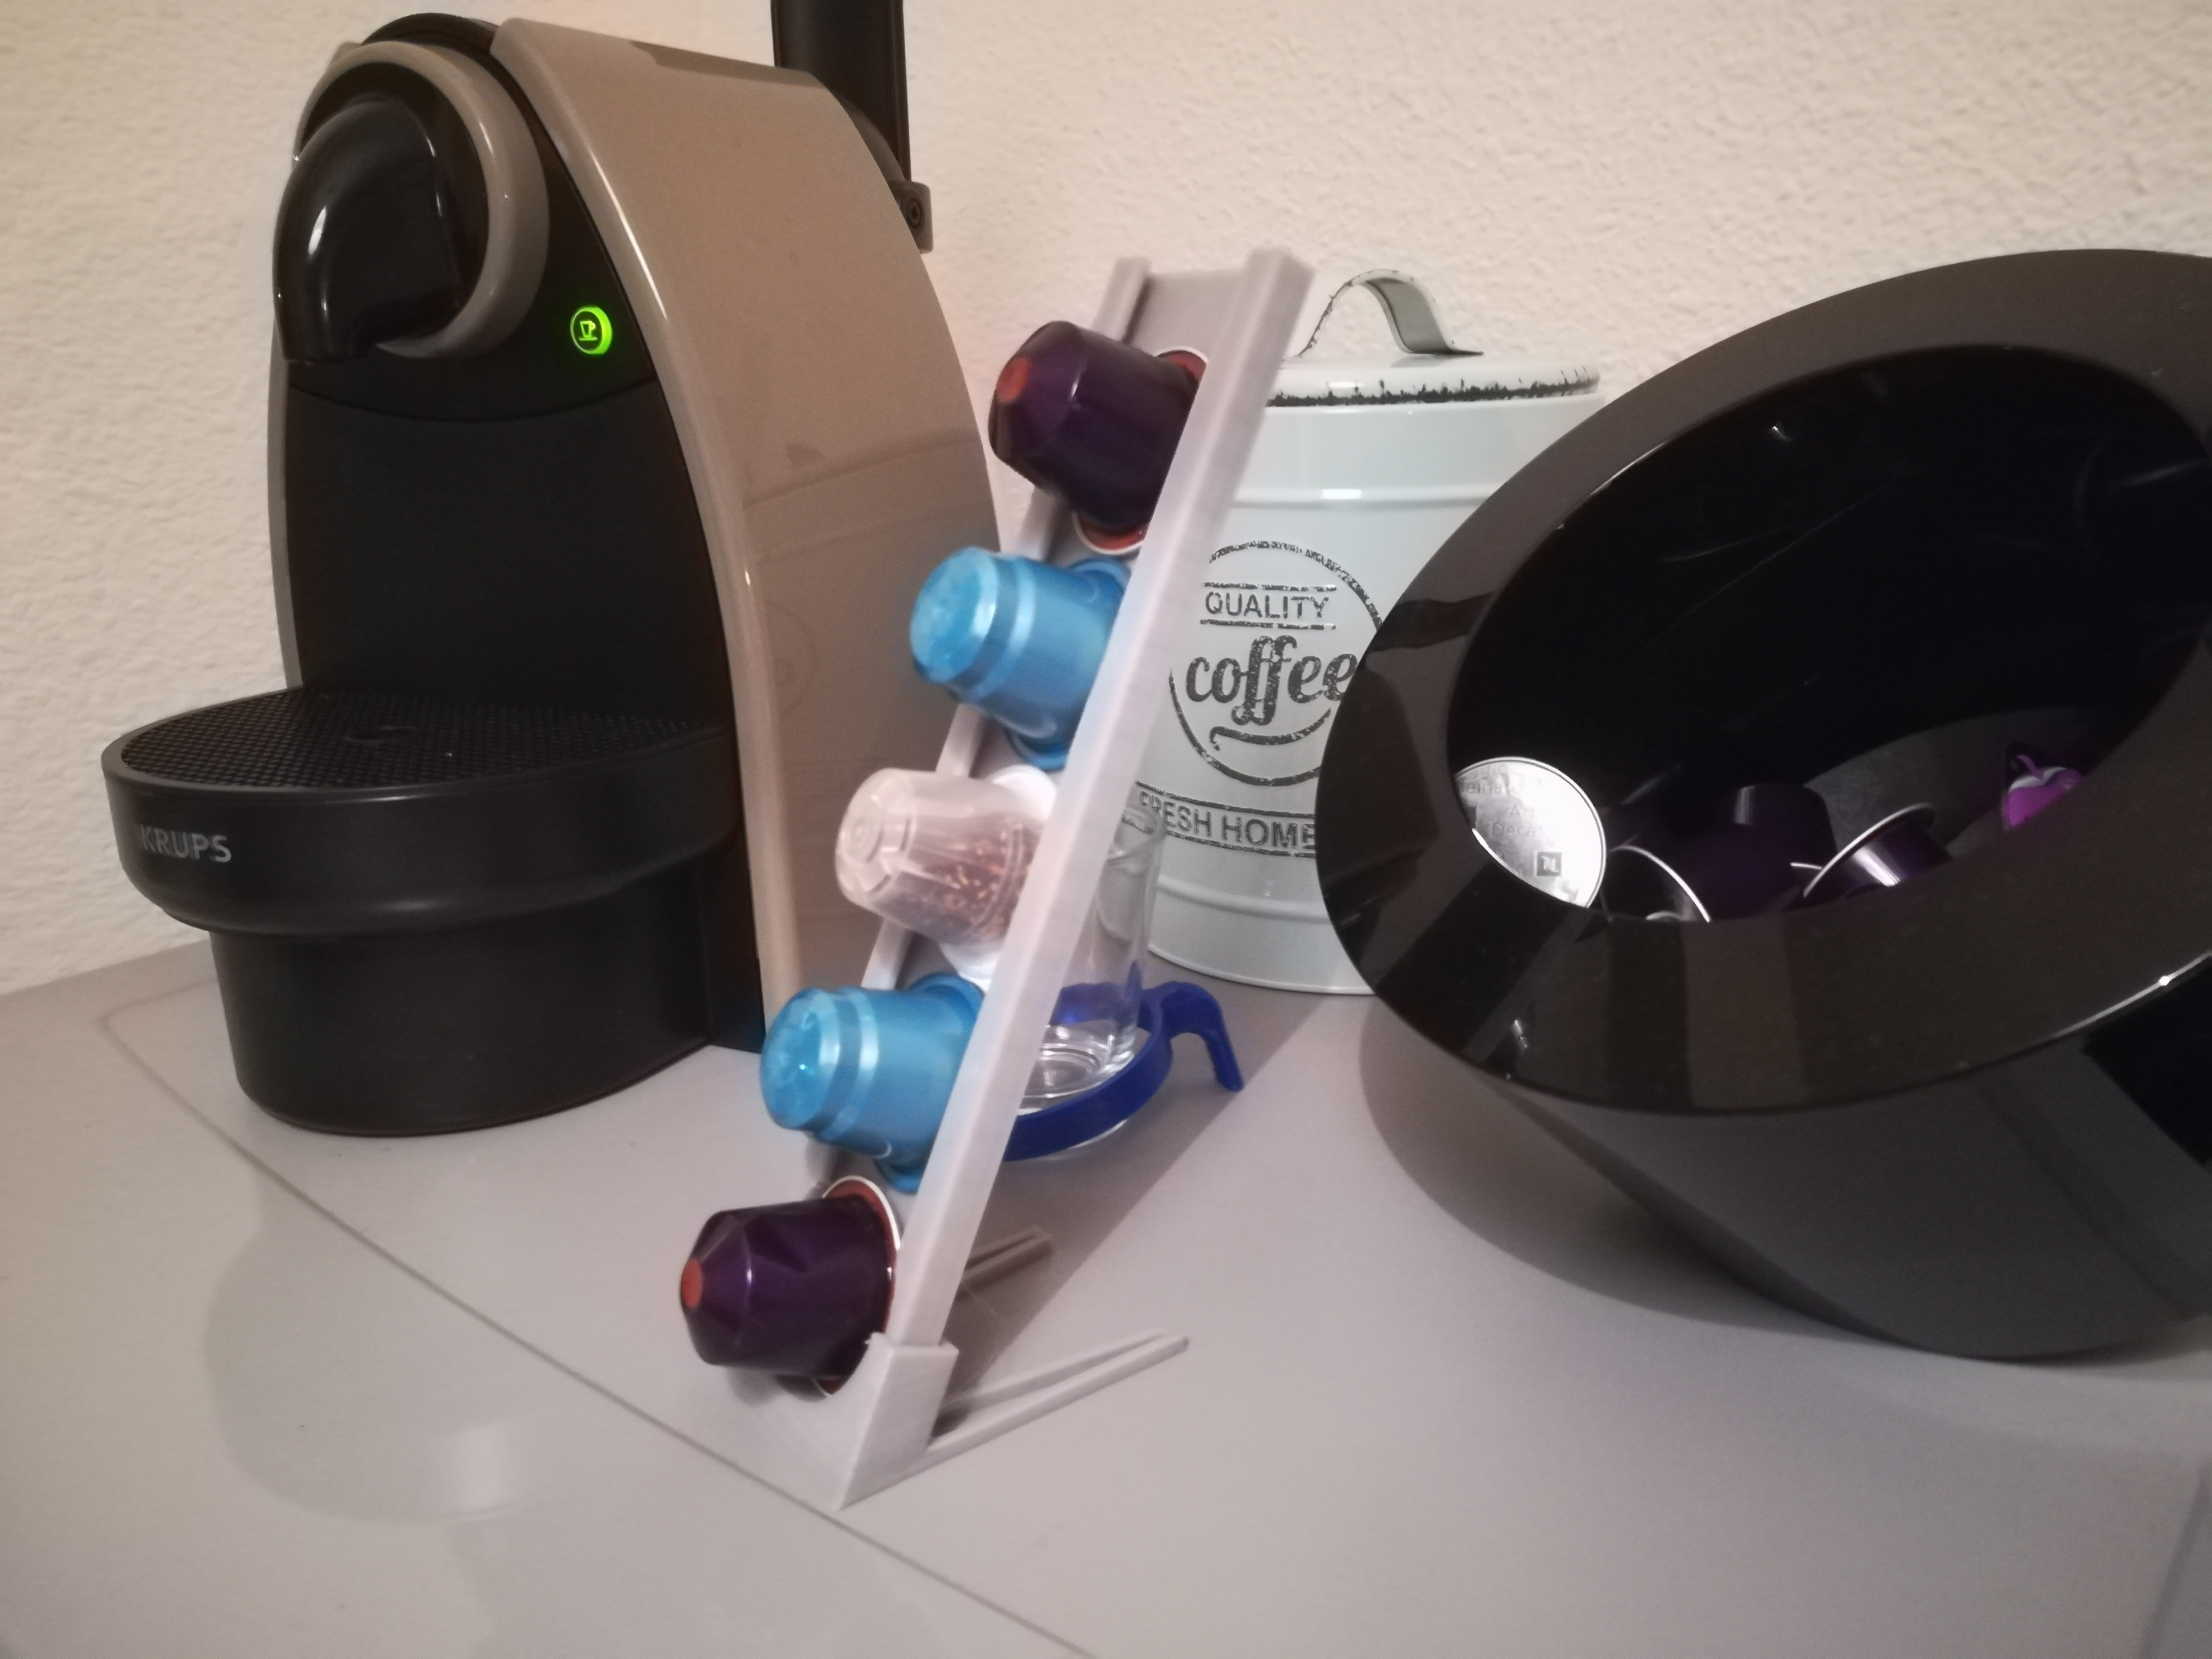 IMG_20180331_210135.jpg Download free STL file Coffee capsule dispenser • 3D print template, DorianAgnel